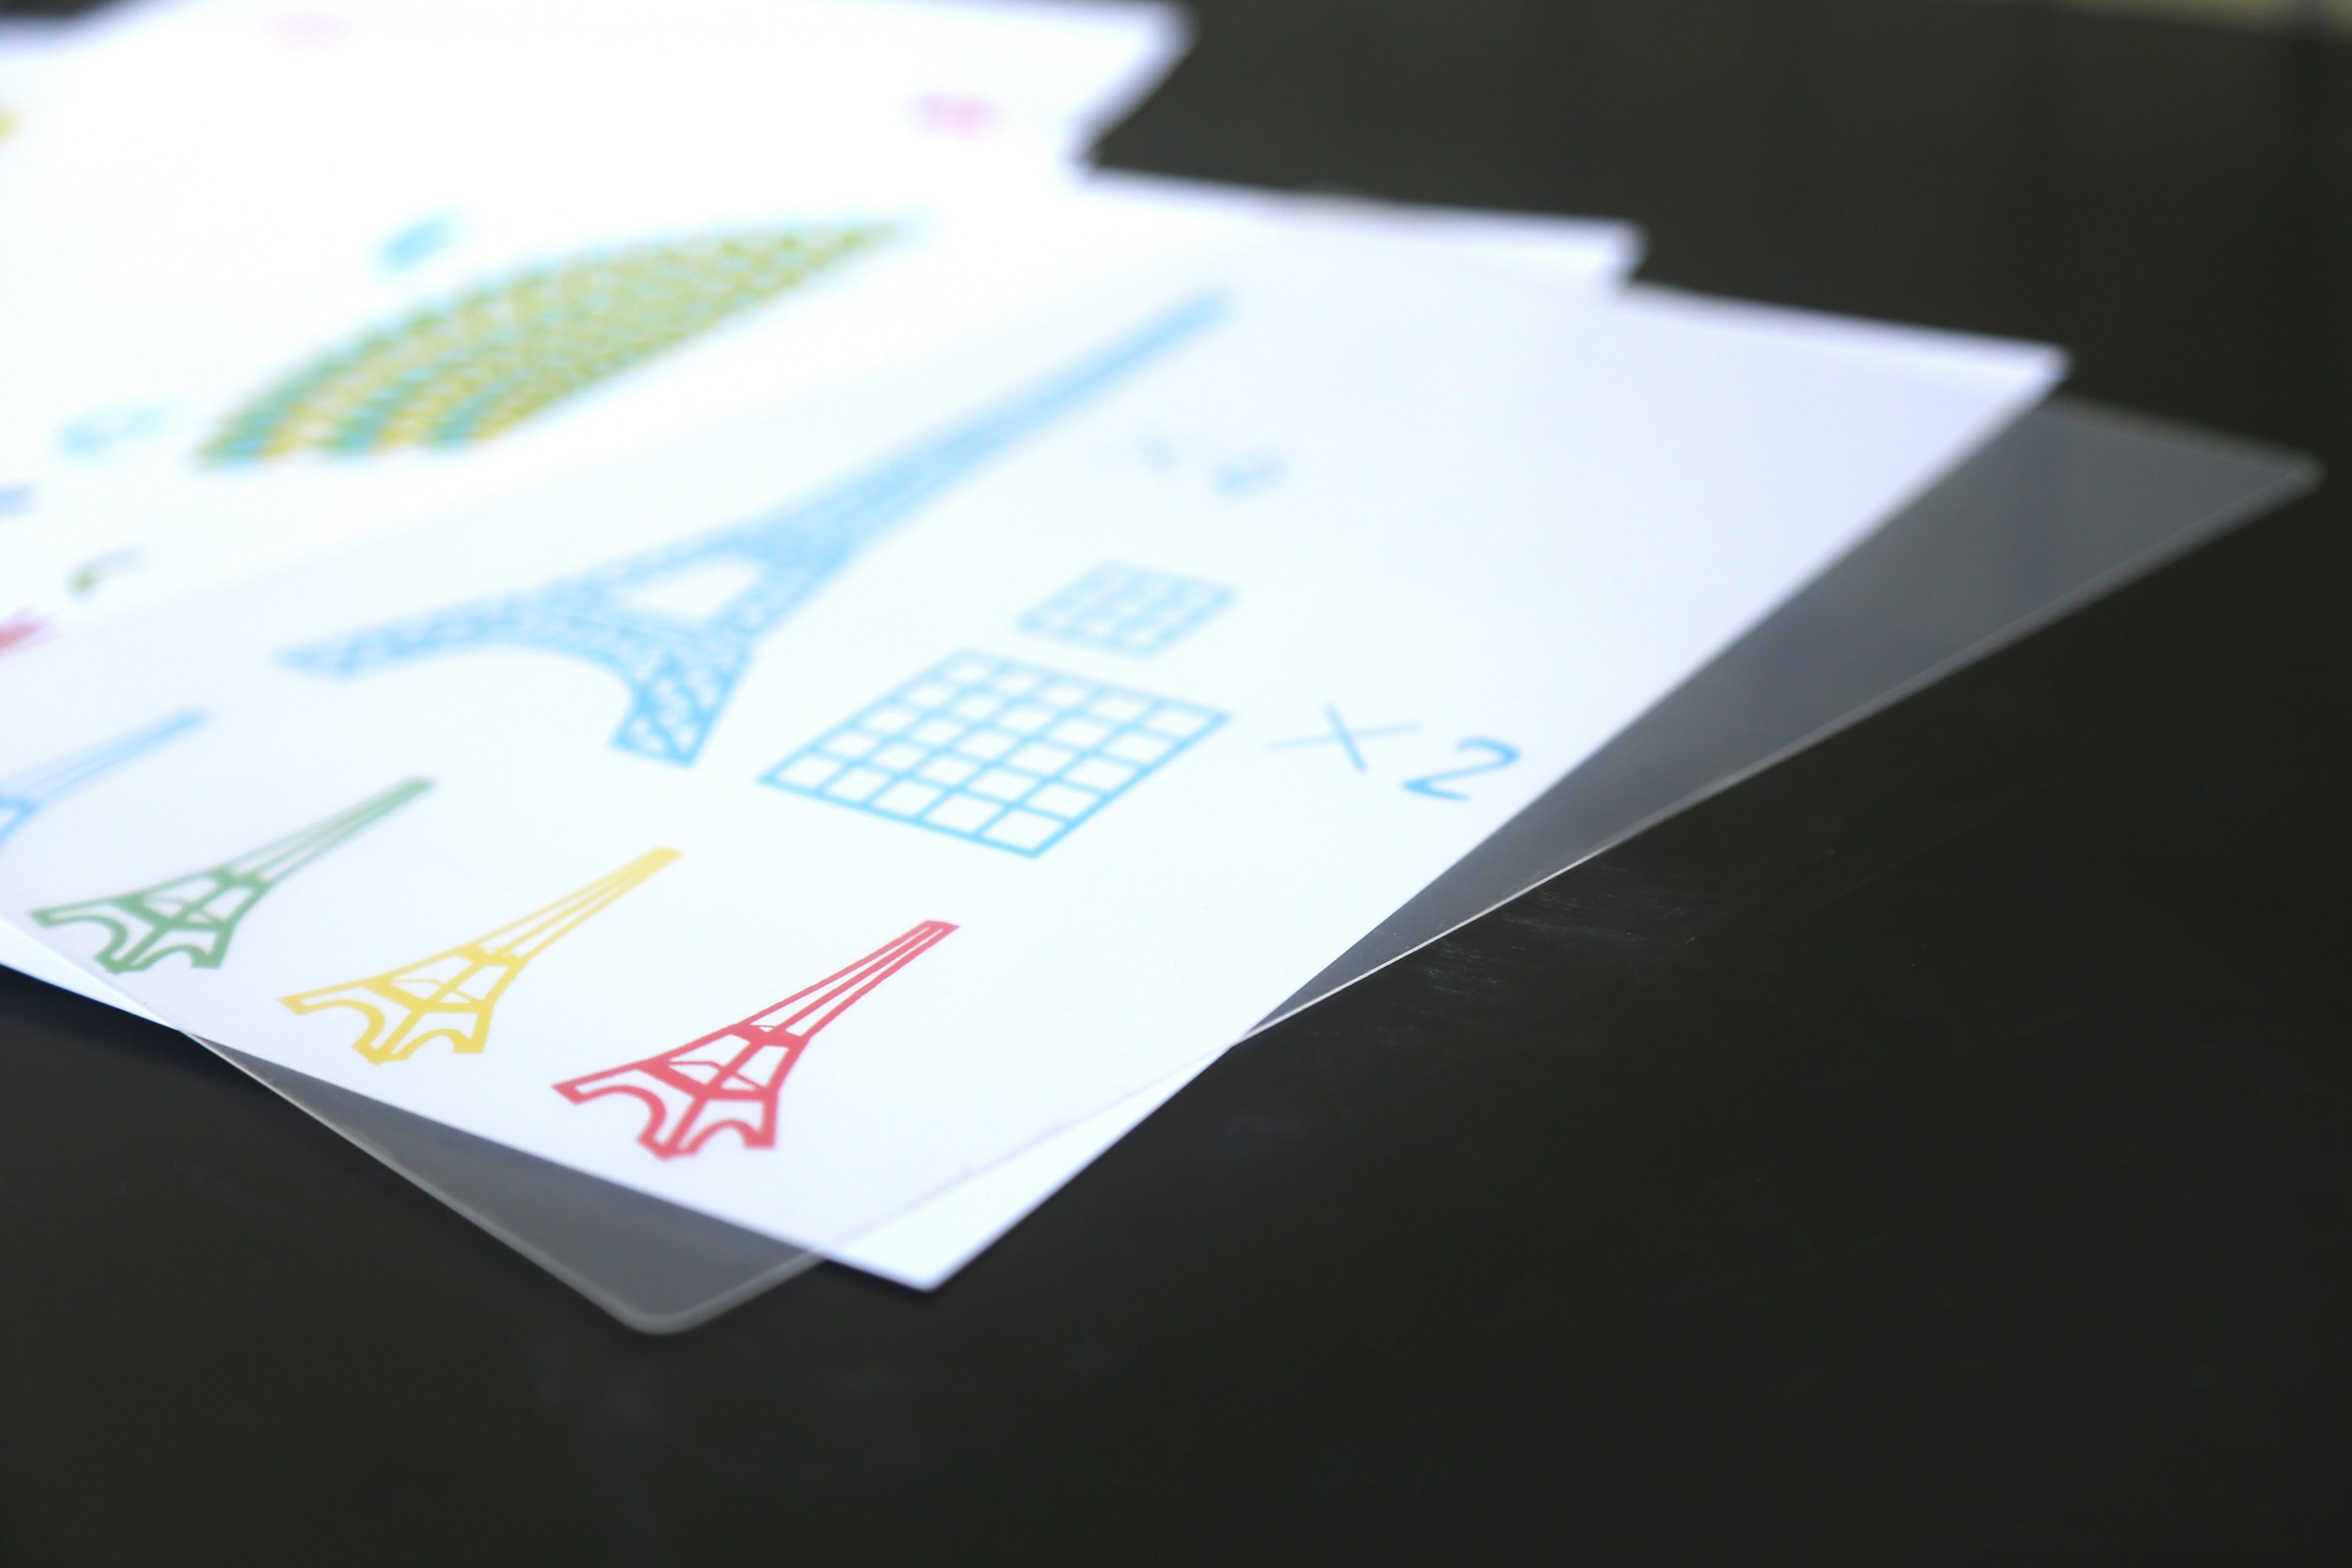 3d Pena 3d Menangani Copy Model Kertas Grafiti Papan Template Copy Papan Pola 20 Referensi Gambar 20 Pcs Copy Papermodels In 3d Pens From Komputer Kantor On Aliexpress